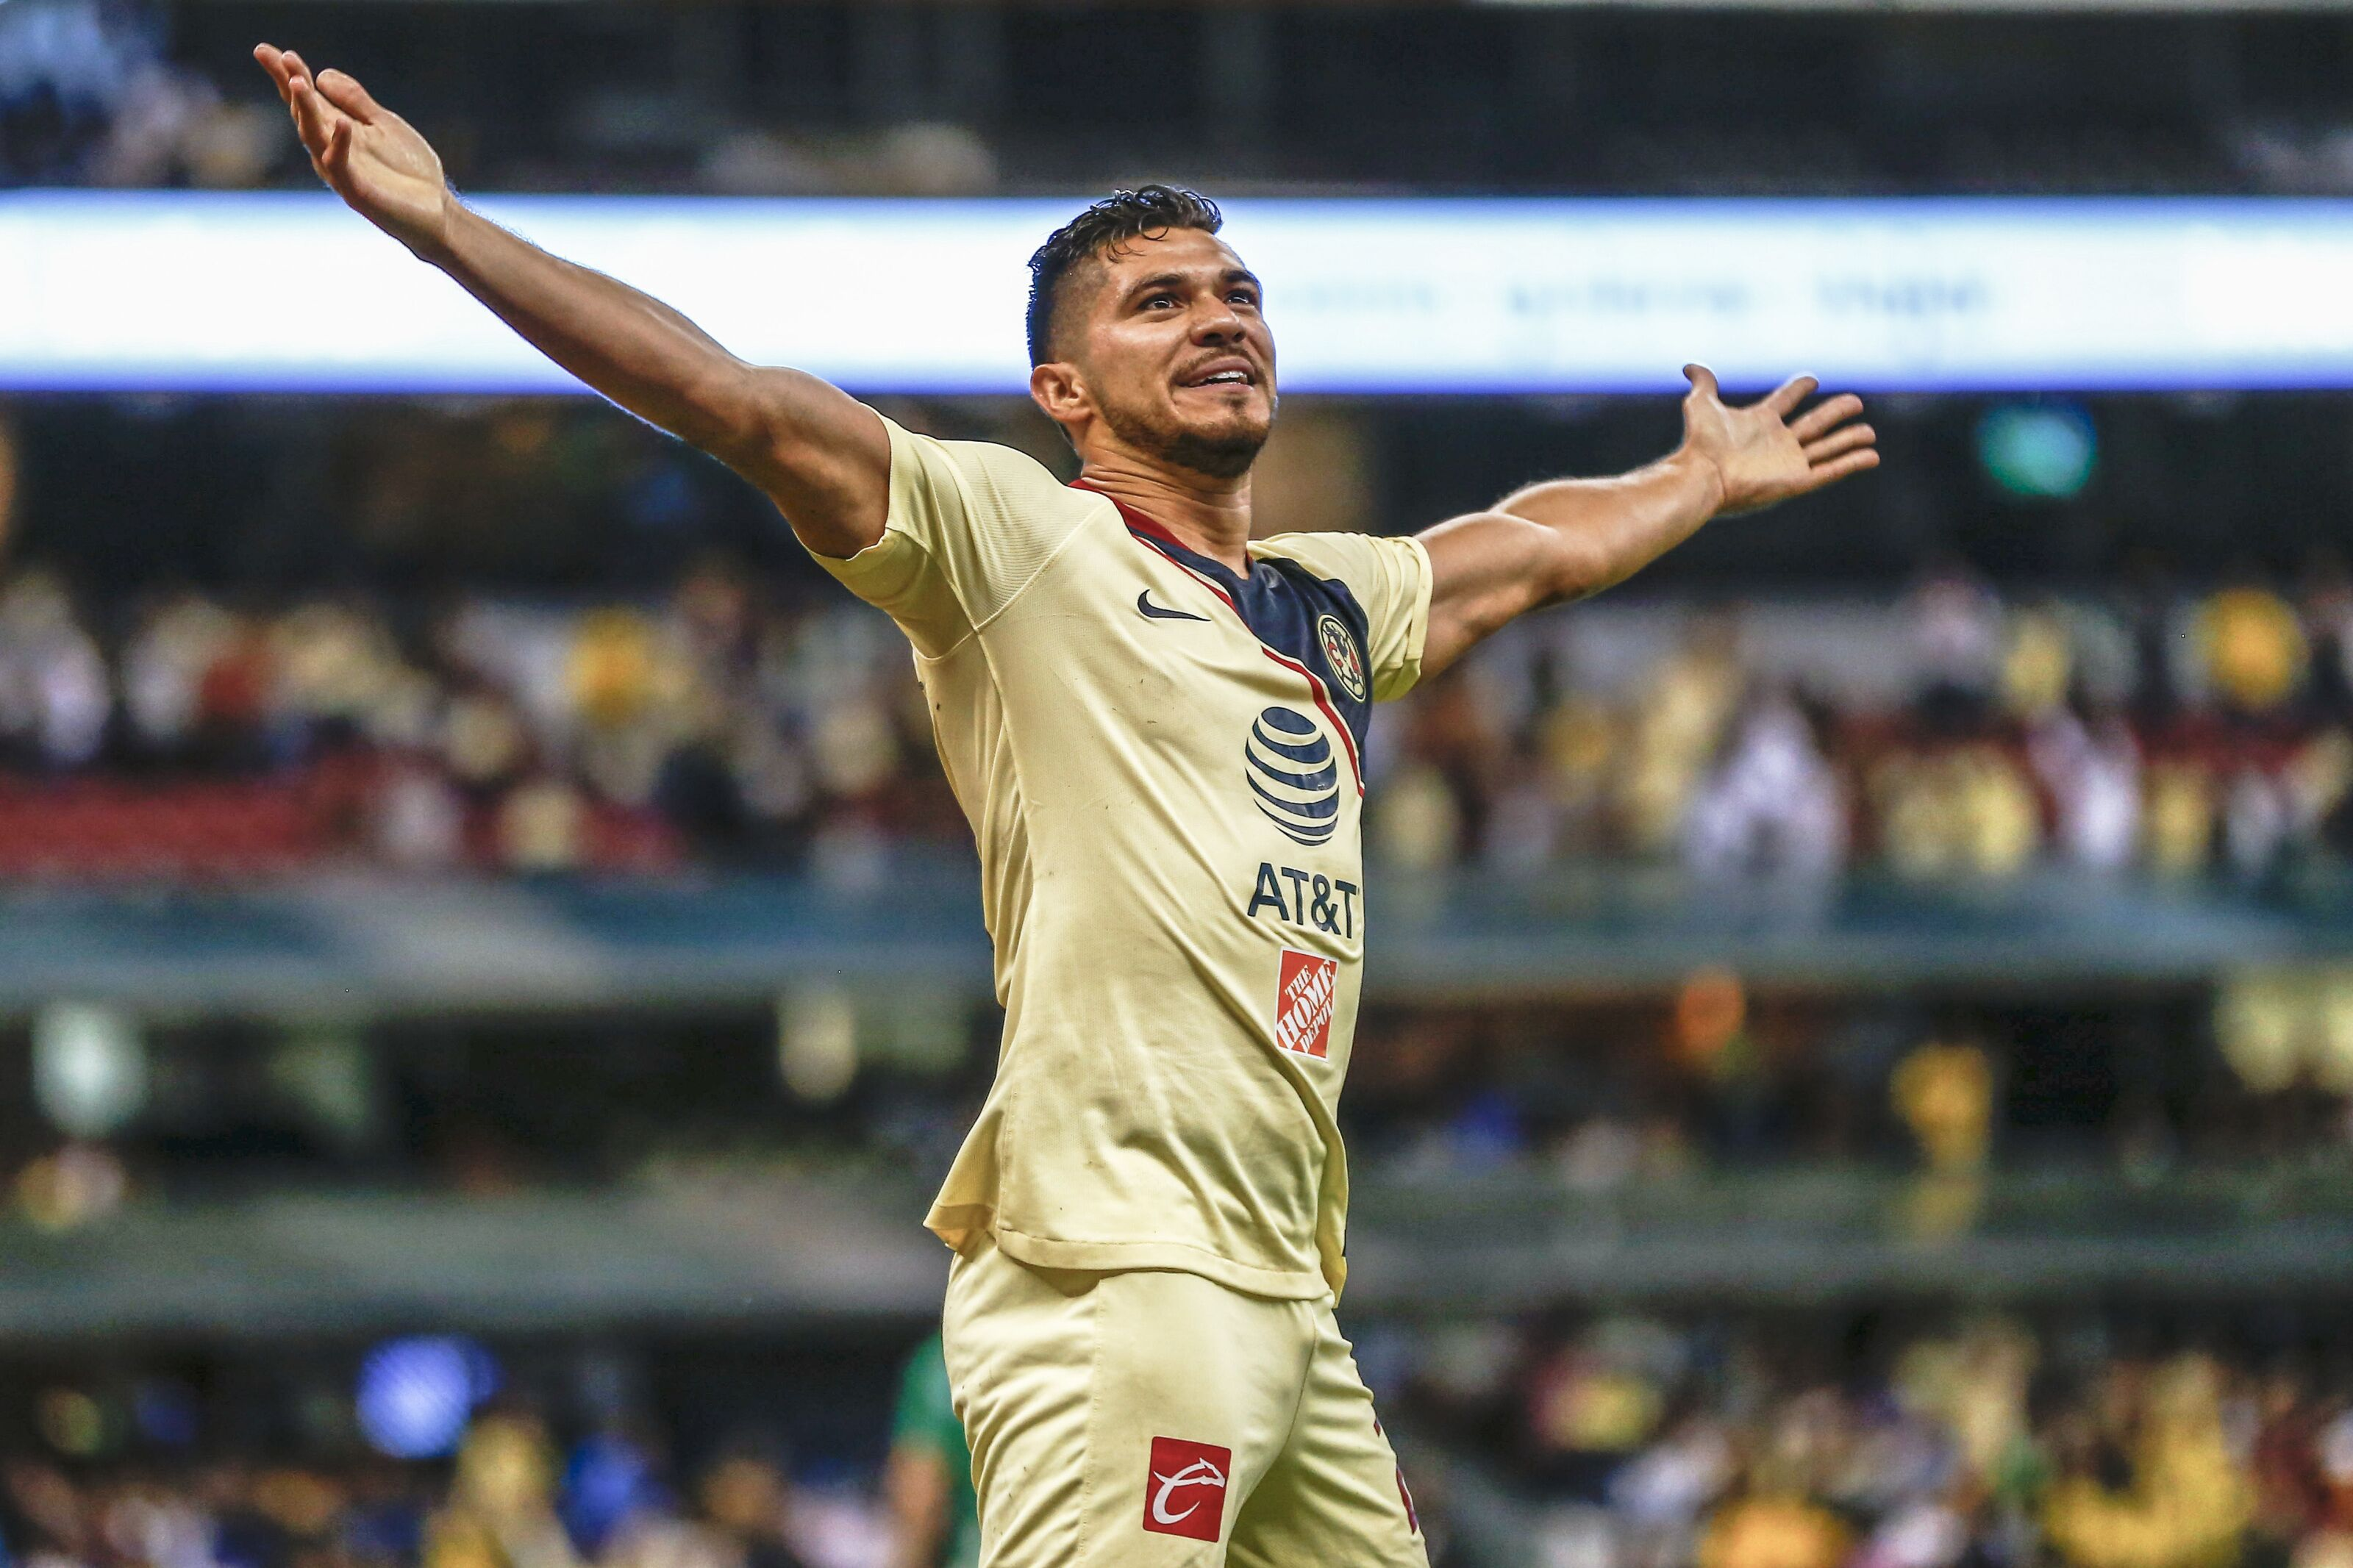 c6c17865650 Liga MX: Nine-man América stuns UNAM with injury-time equalizer